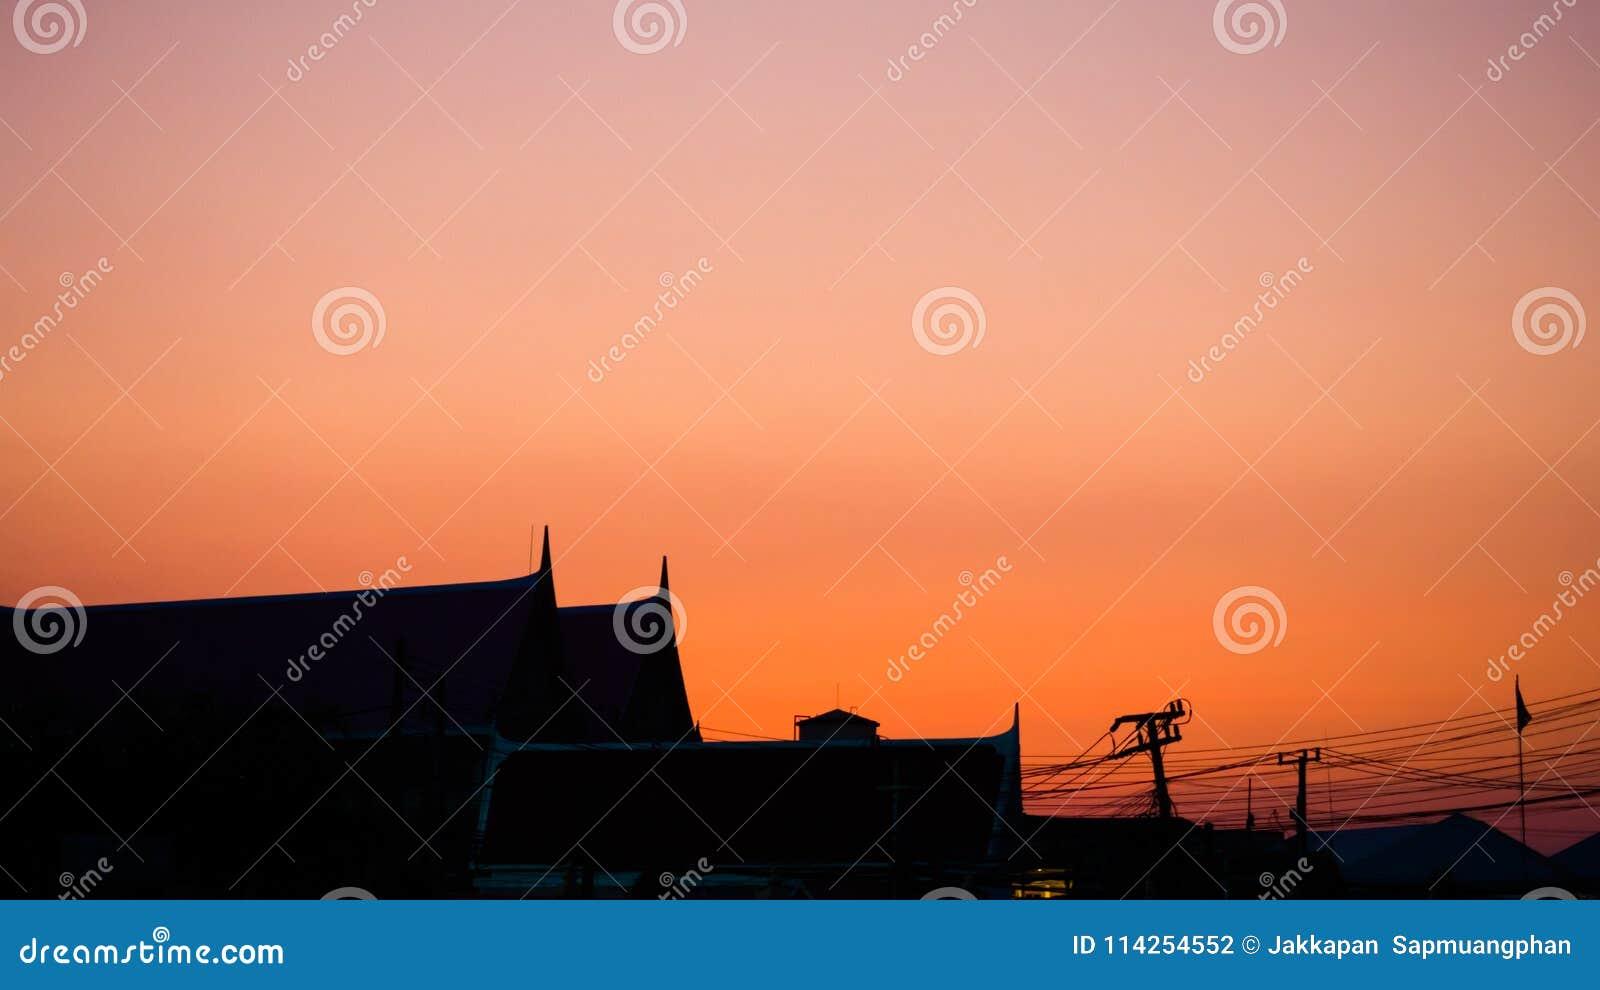 Orange Himmelsonnenuntergang des Siluate-Tempeldachs